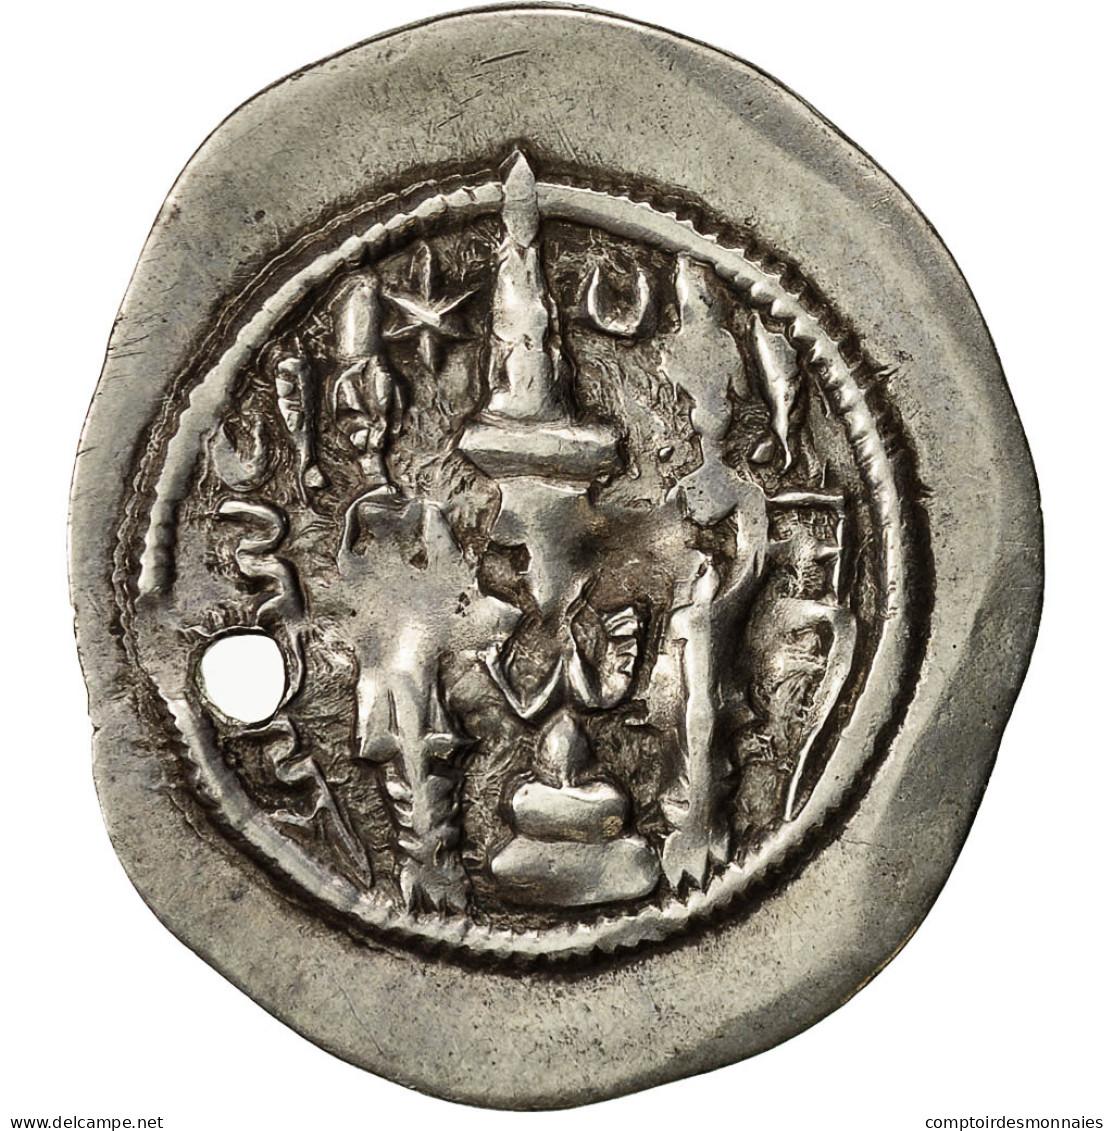 Monnaie, Khusrau I, Drachme, 531-579, TTB, Argent - Orientales